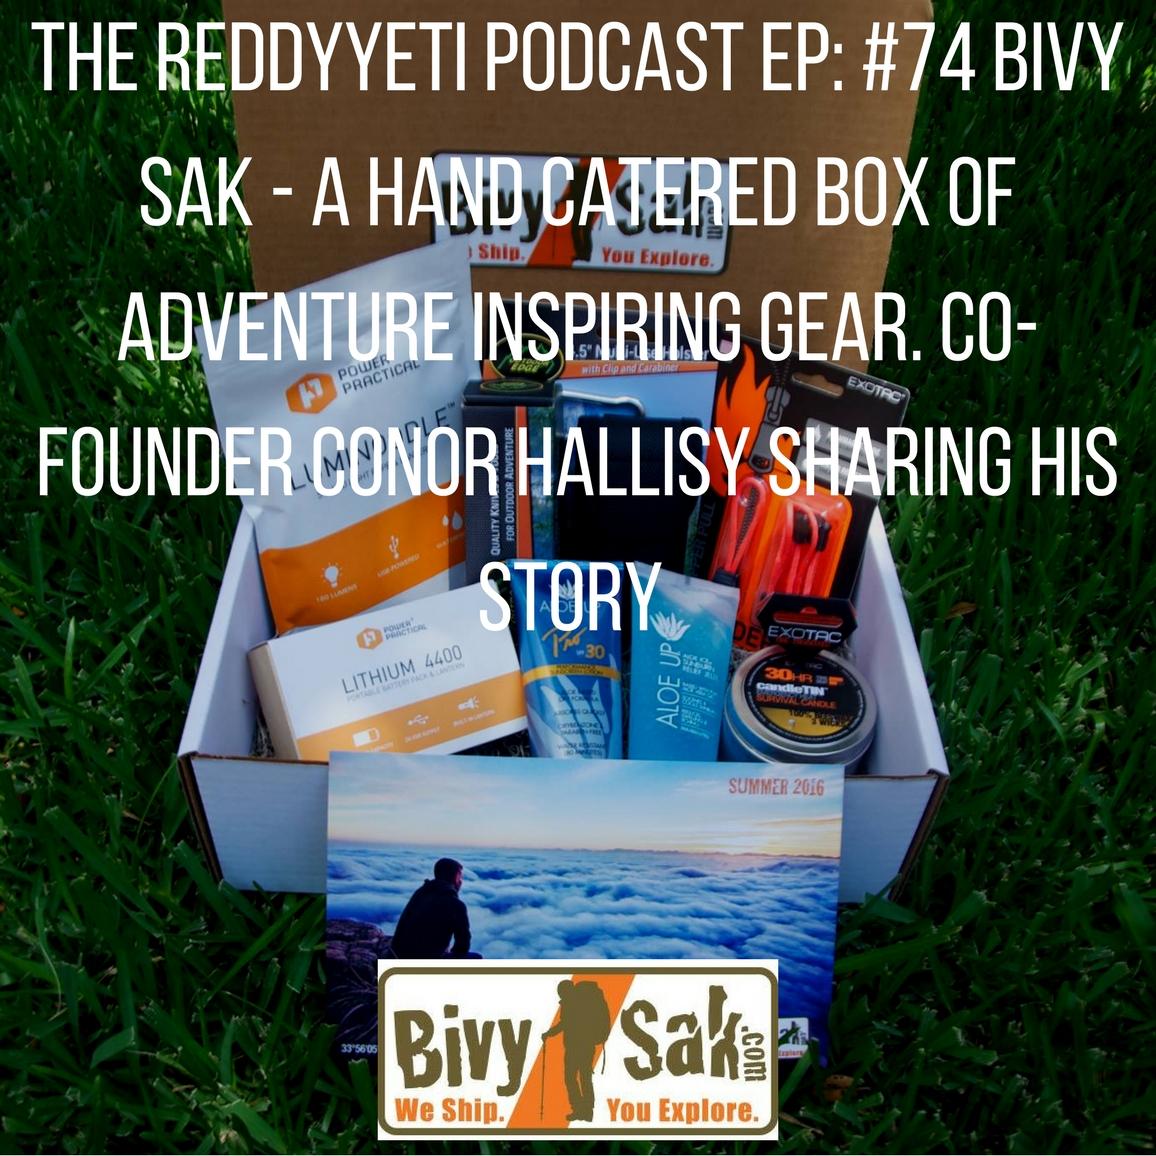 Bivy Sak Podcast image.jpg